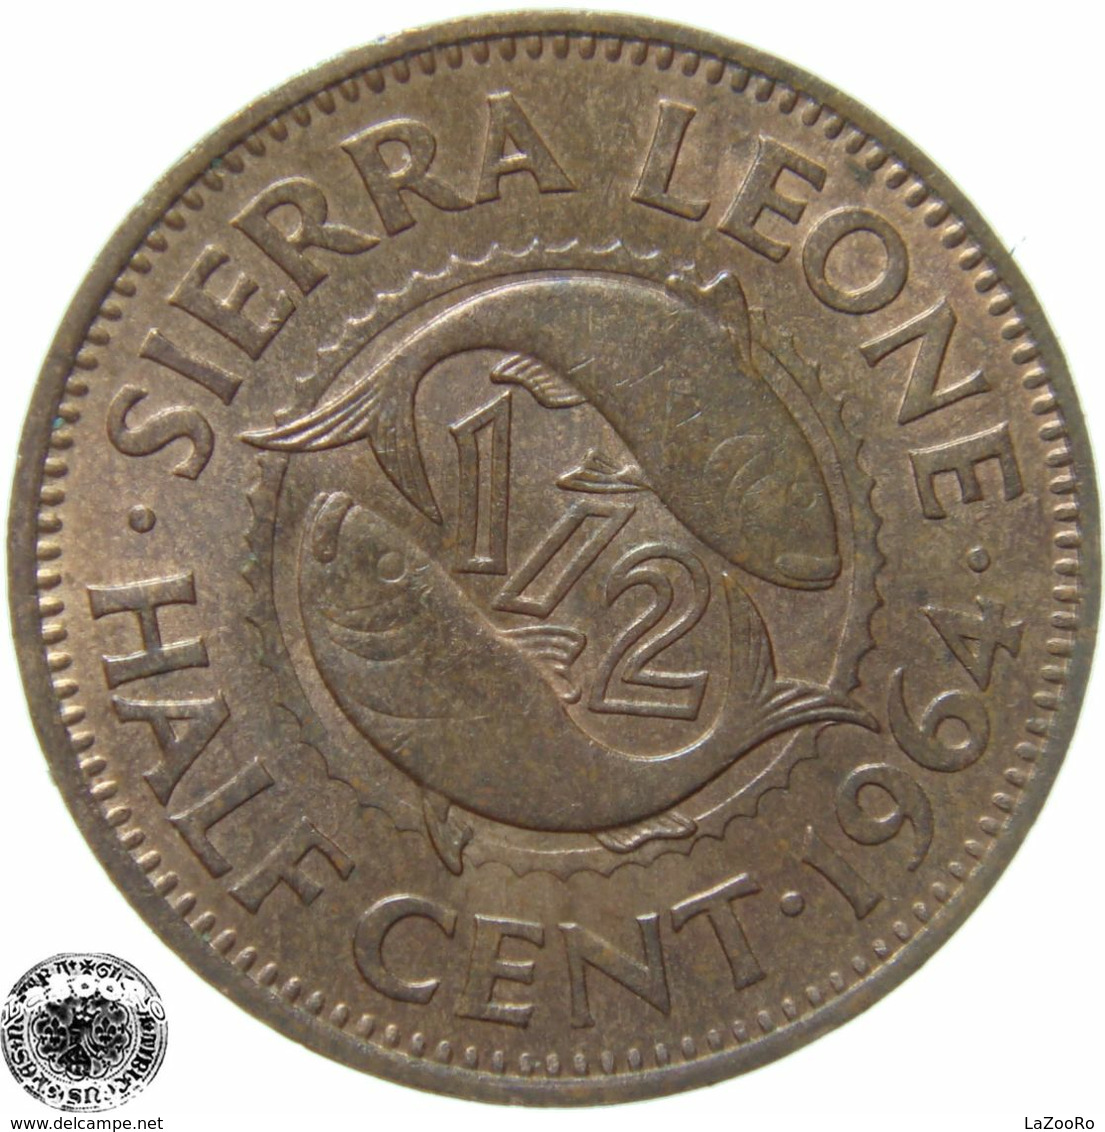 LaZooRo: Sierra Leone 1/2 Cent 1964 UNC - Sierra Leone